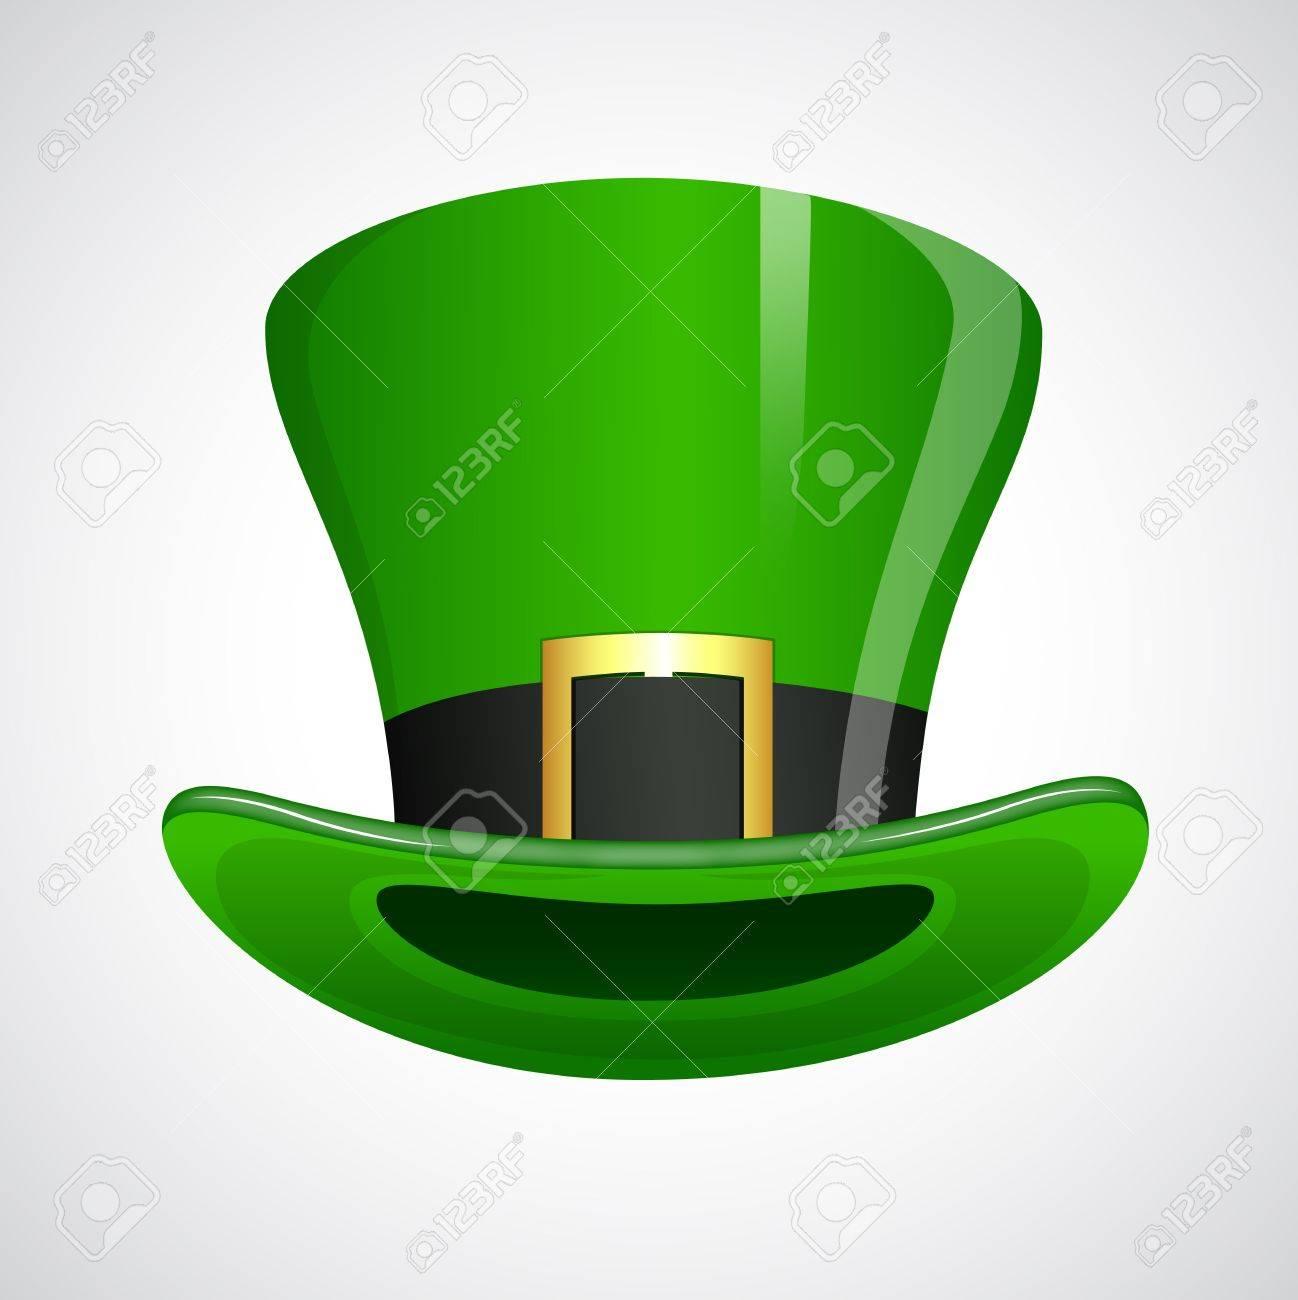 St  Patrick's Day Leprechaun Hat Stock Vector - 12655003